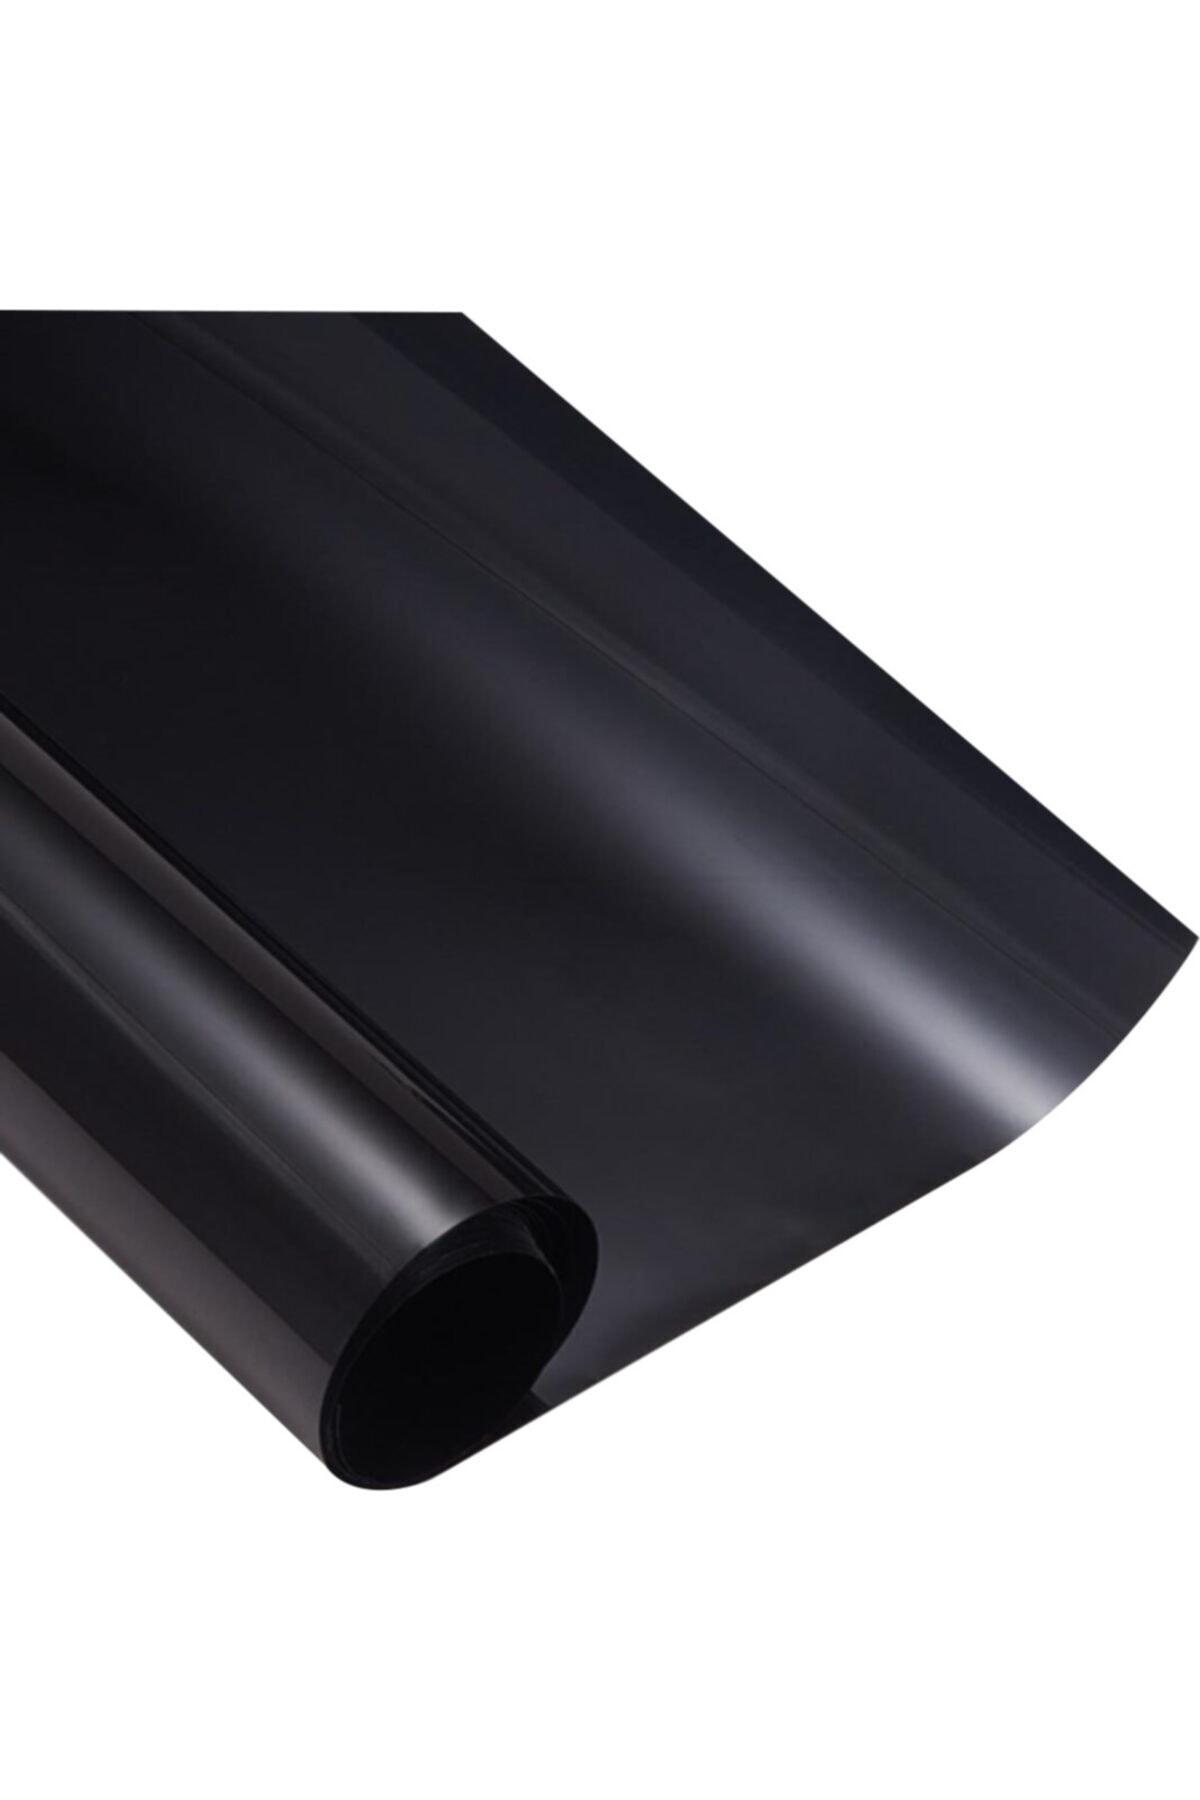 Siyah Cam Filmi Koyu Ton 50cm X 6m